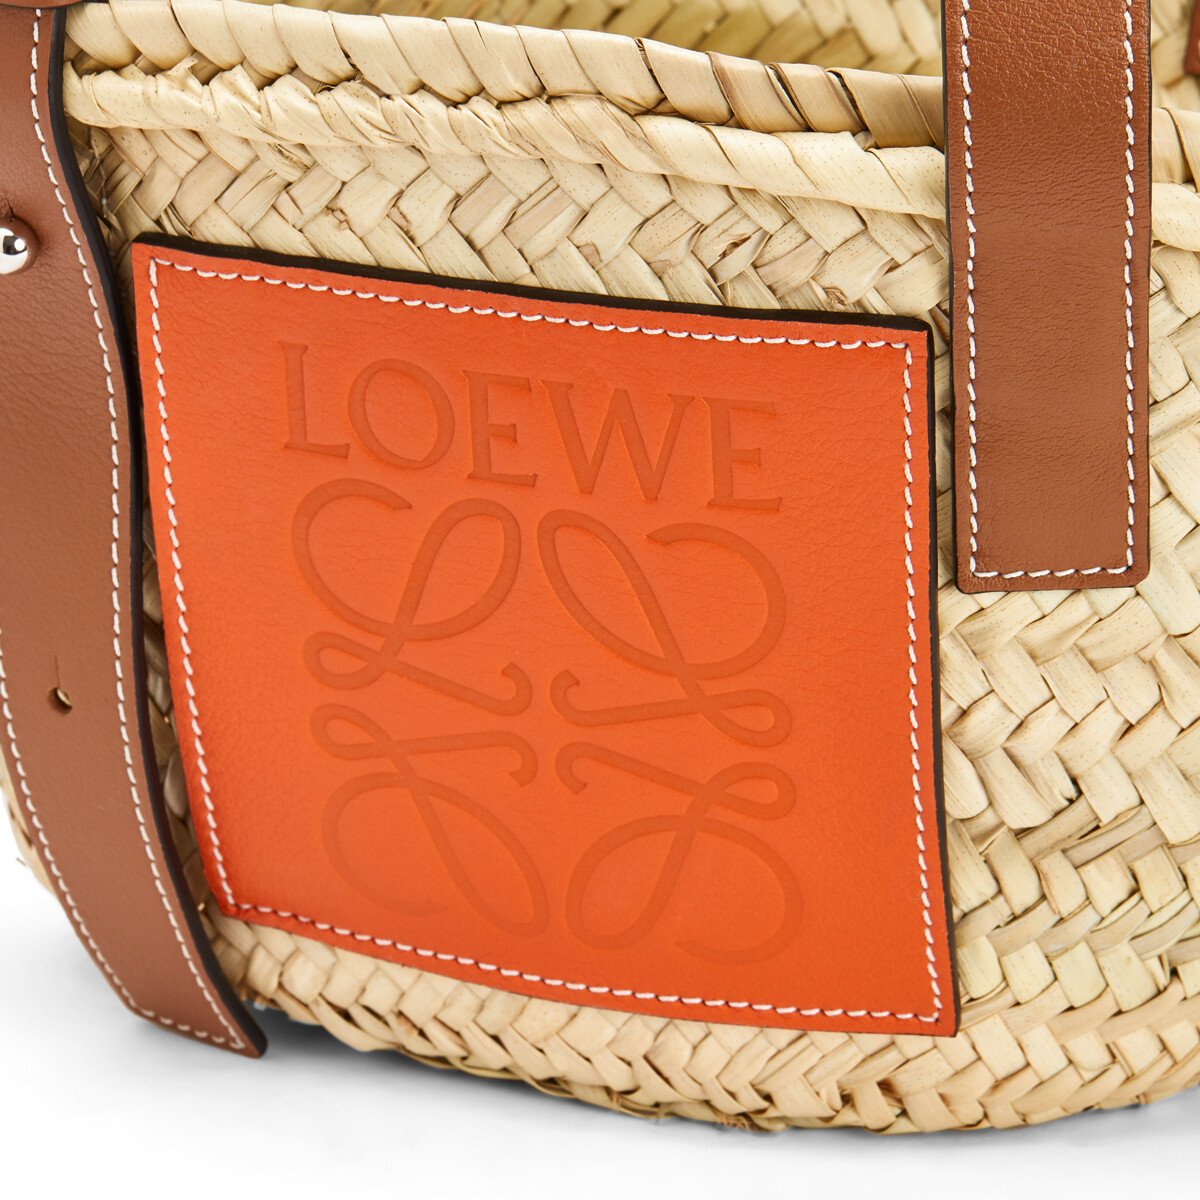 LOEWE Basket Small Natural/Orange front